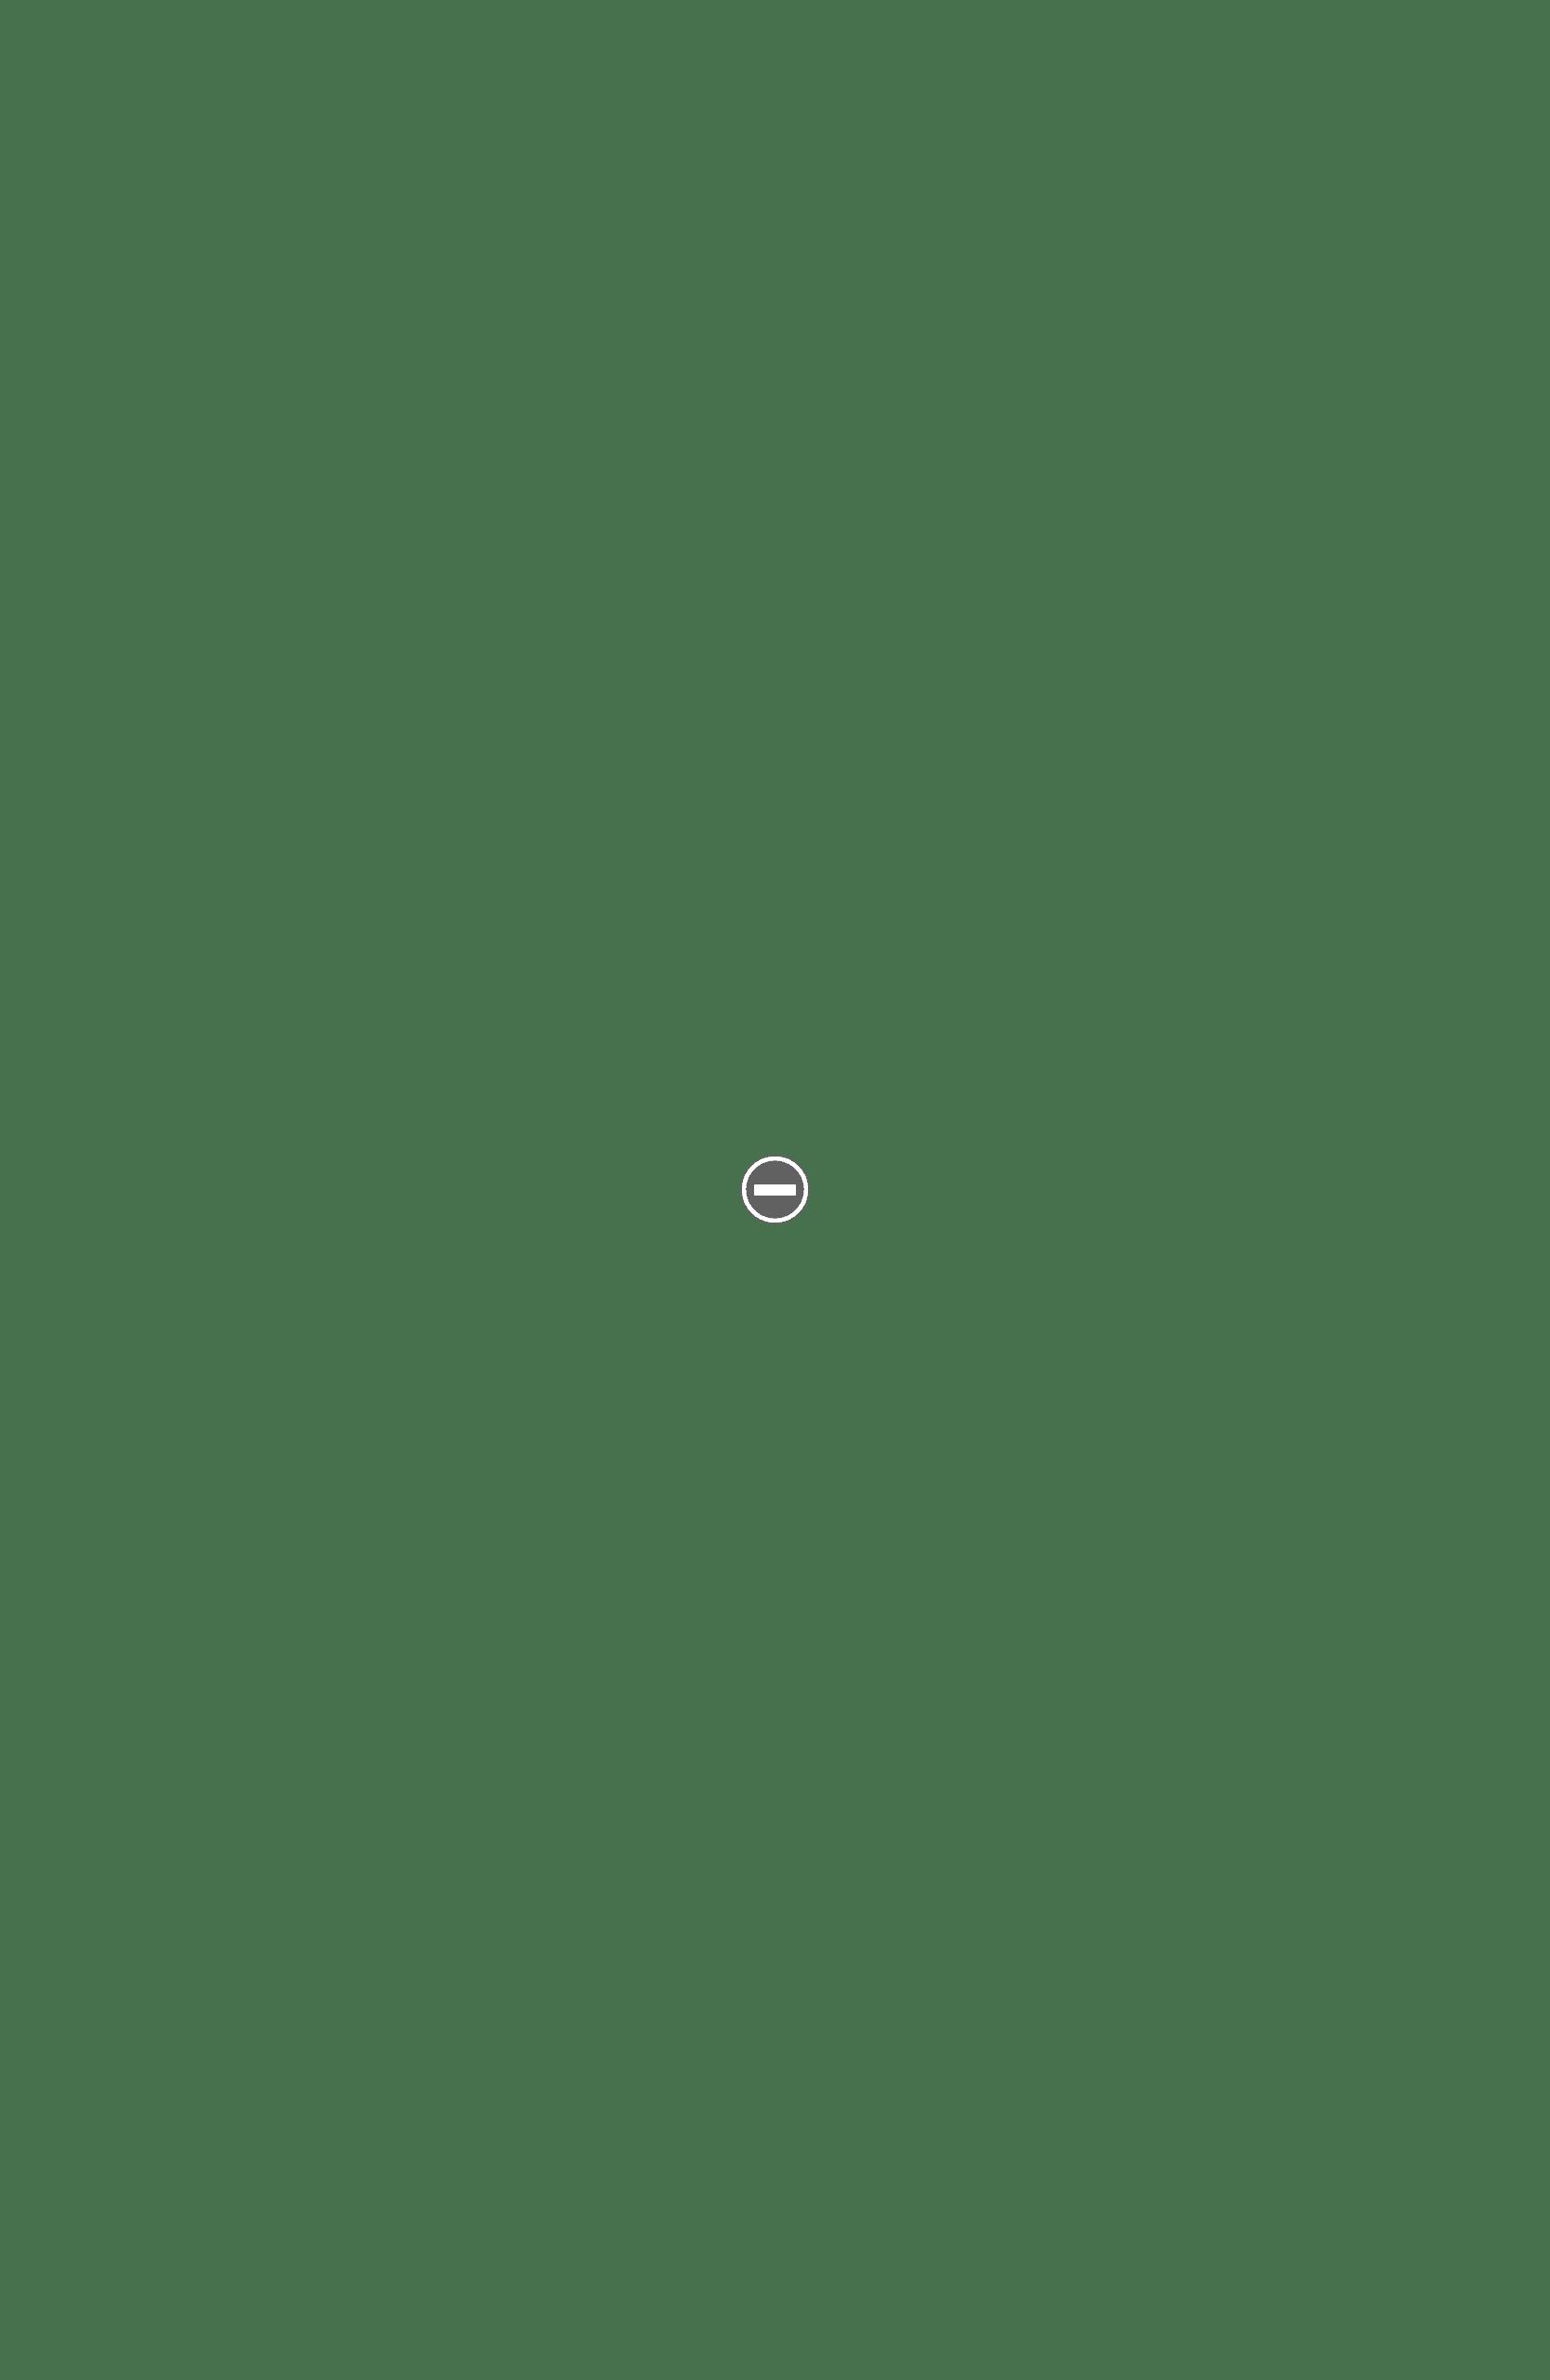 Wolverine (1997) - komplett